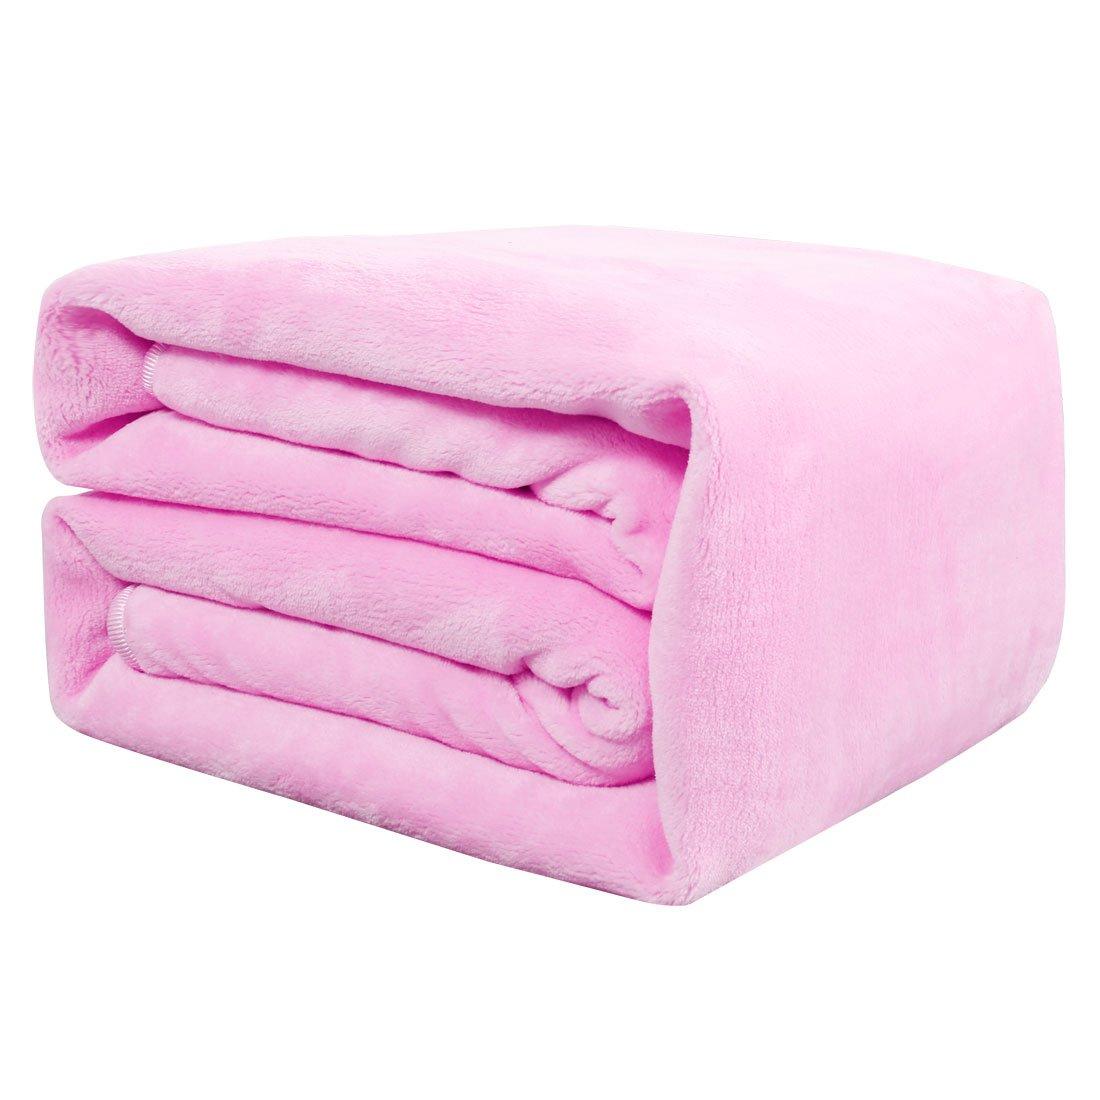 uxcell Flannel Fleece Blanket Super Soft Lightweight Warm Fuzzy Throw Couch Bed Blanket Pink 200cm x 230cm